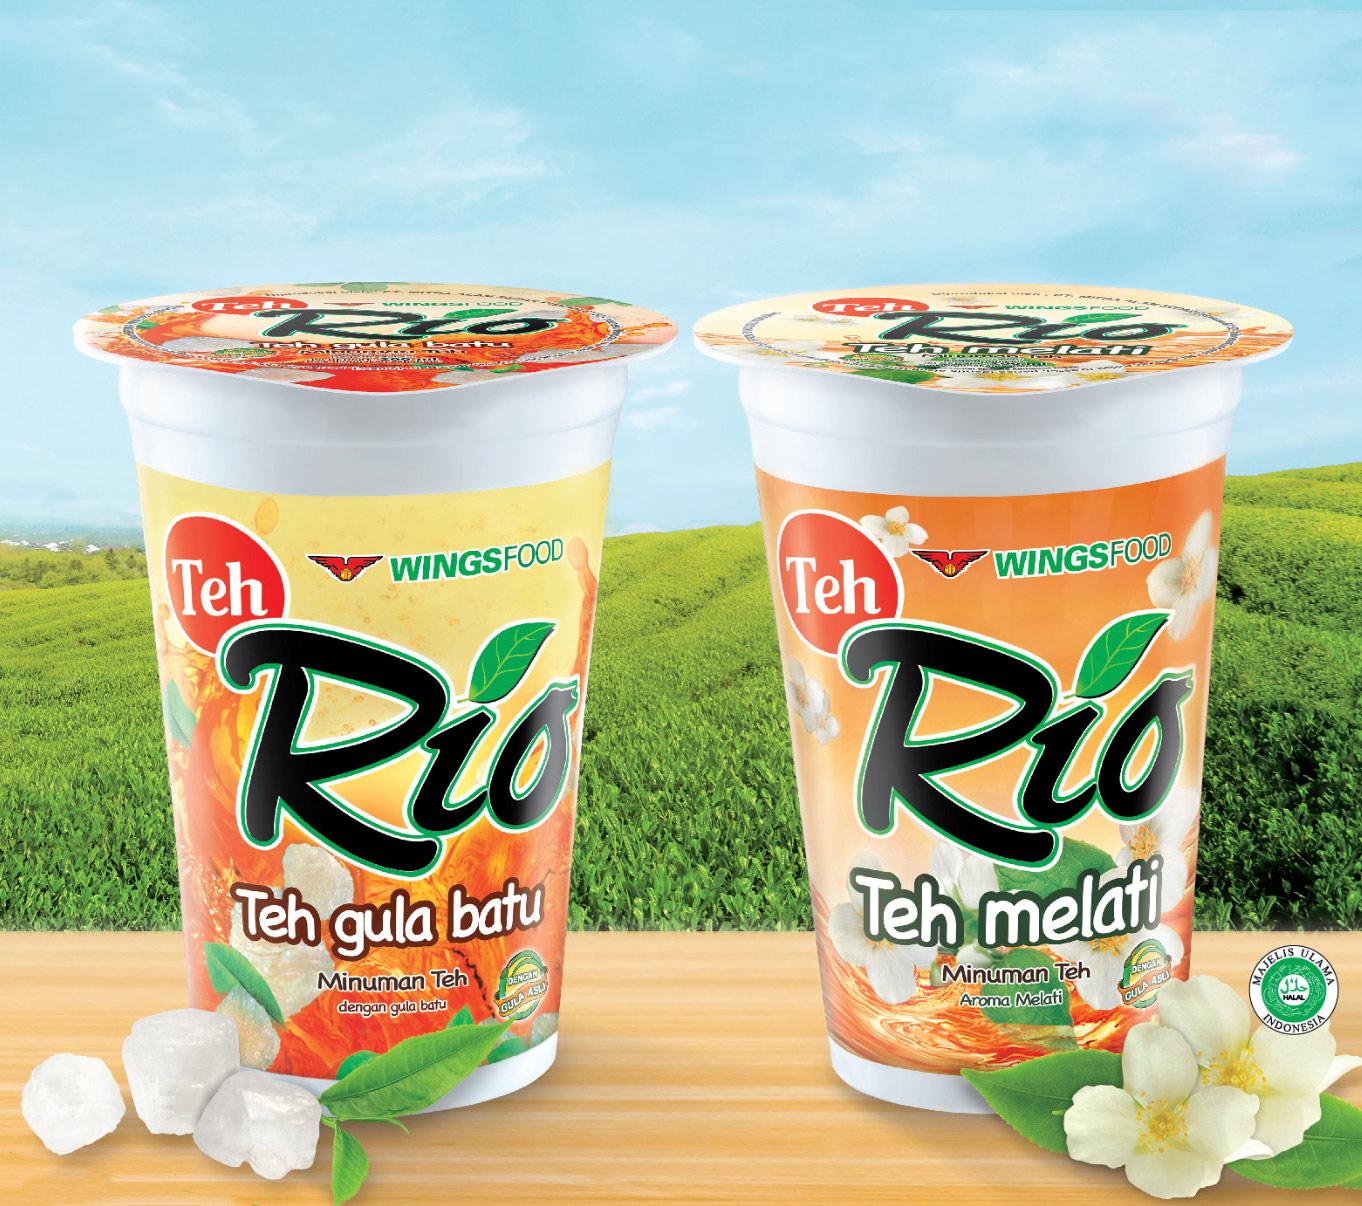 Rio Wingsfood